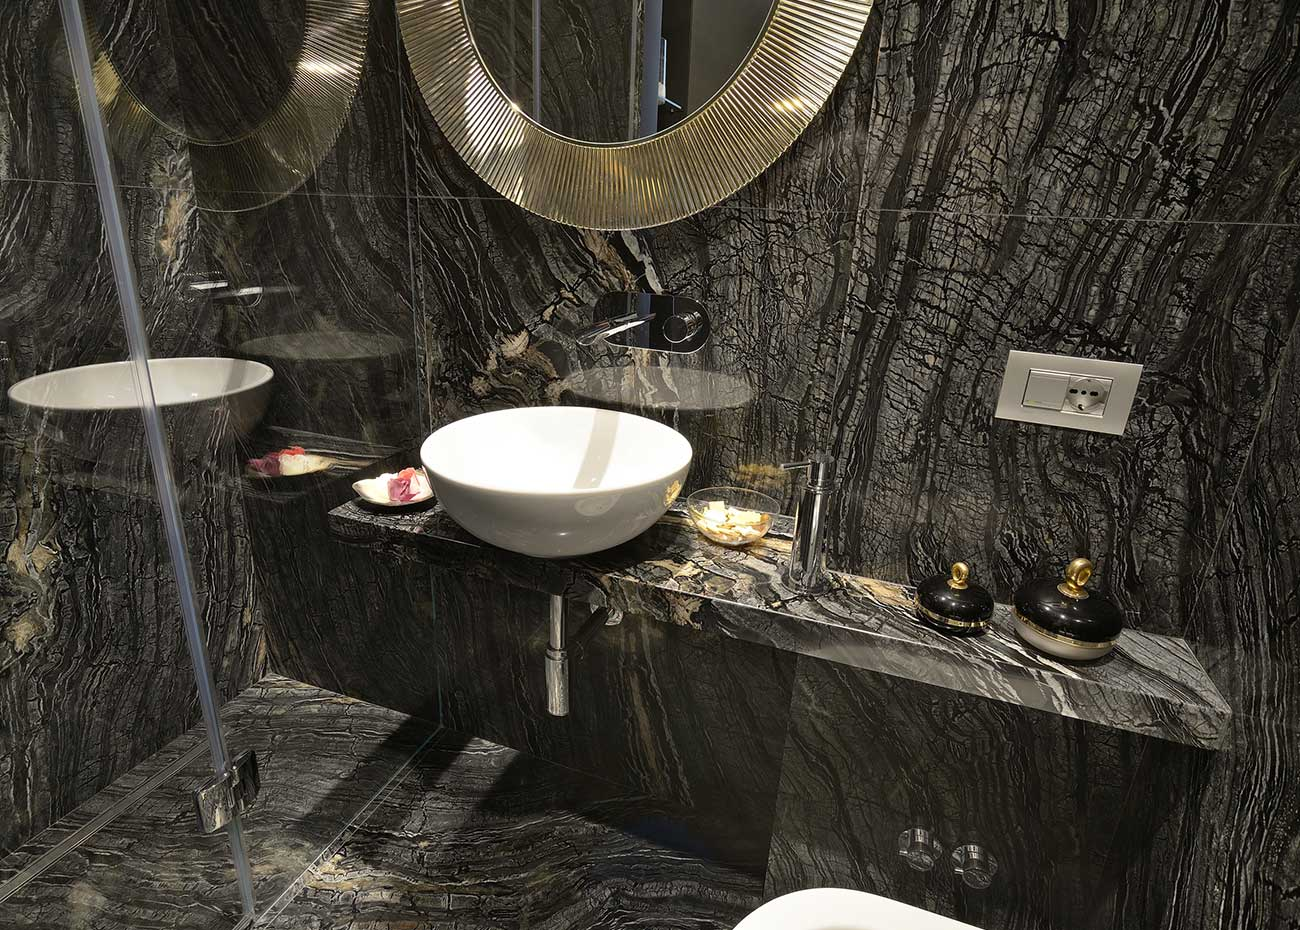 bagno-in-marmo-asiatico-black-wood